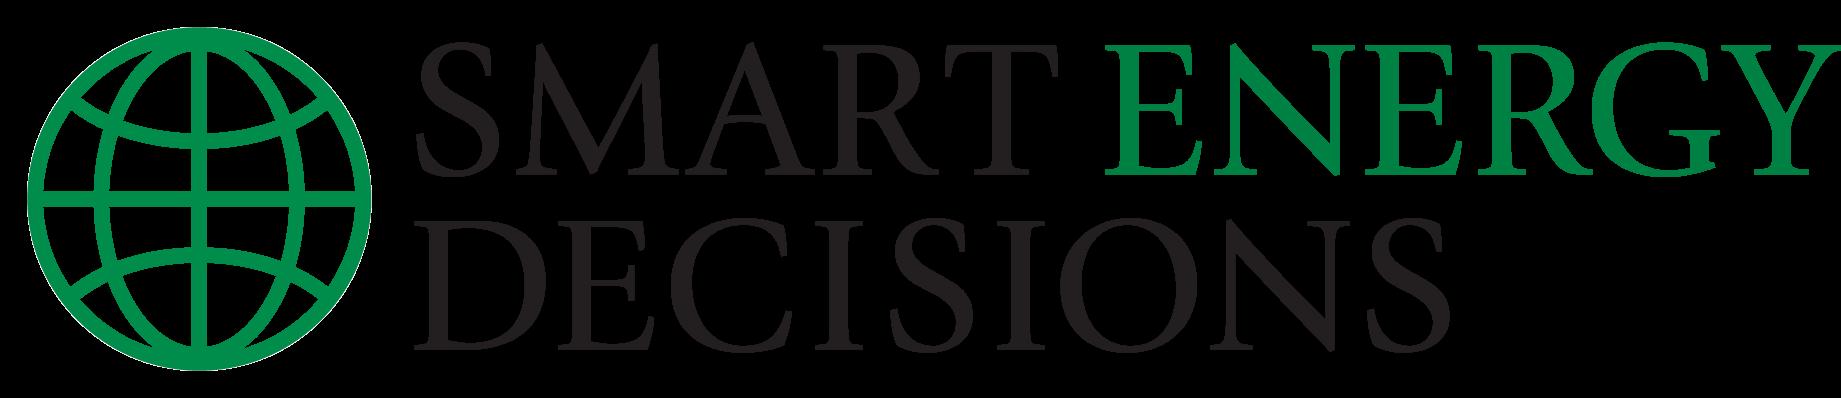 Smart Energy Decisions